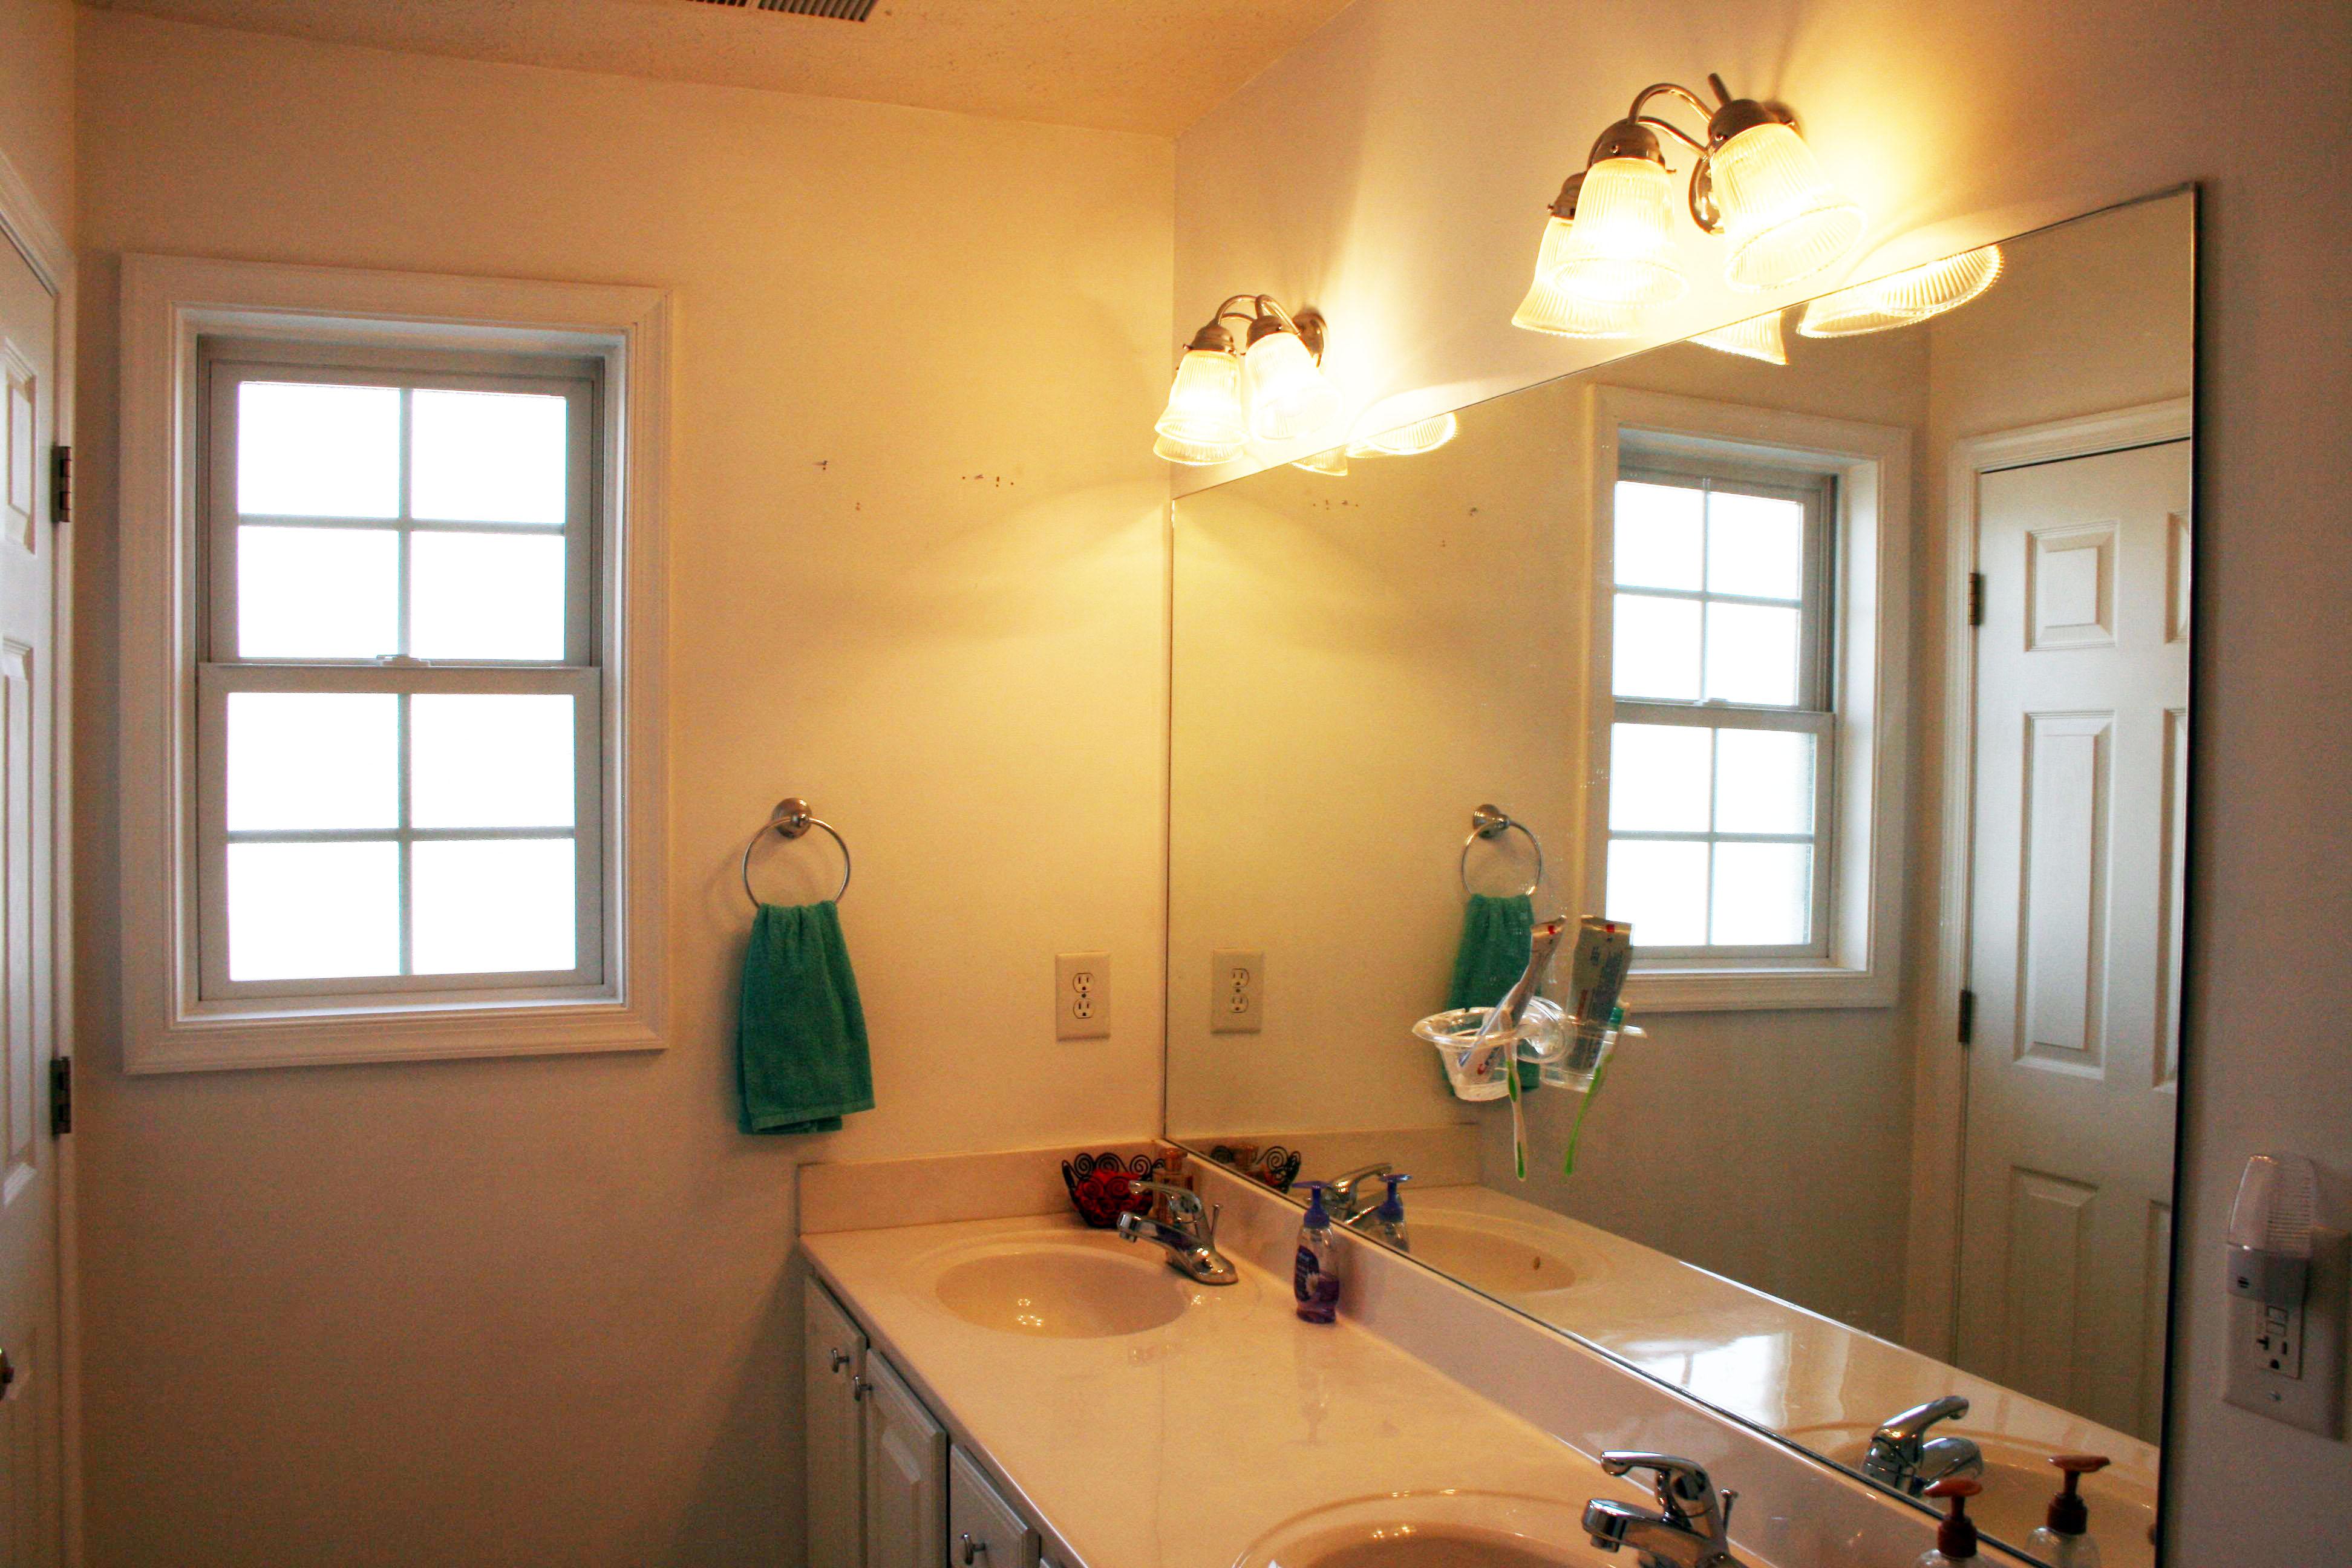 pinthis bathroom lighting fixture